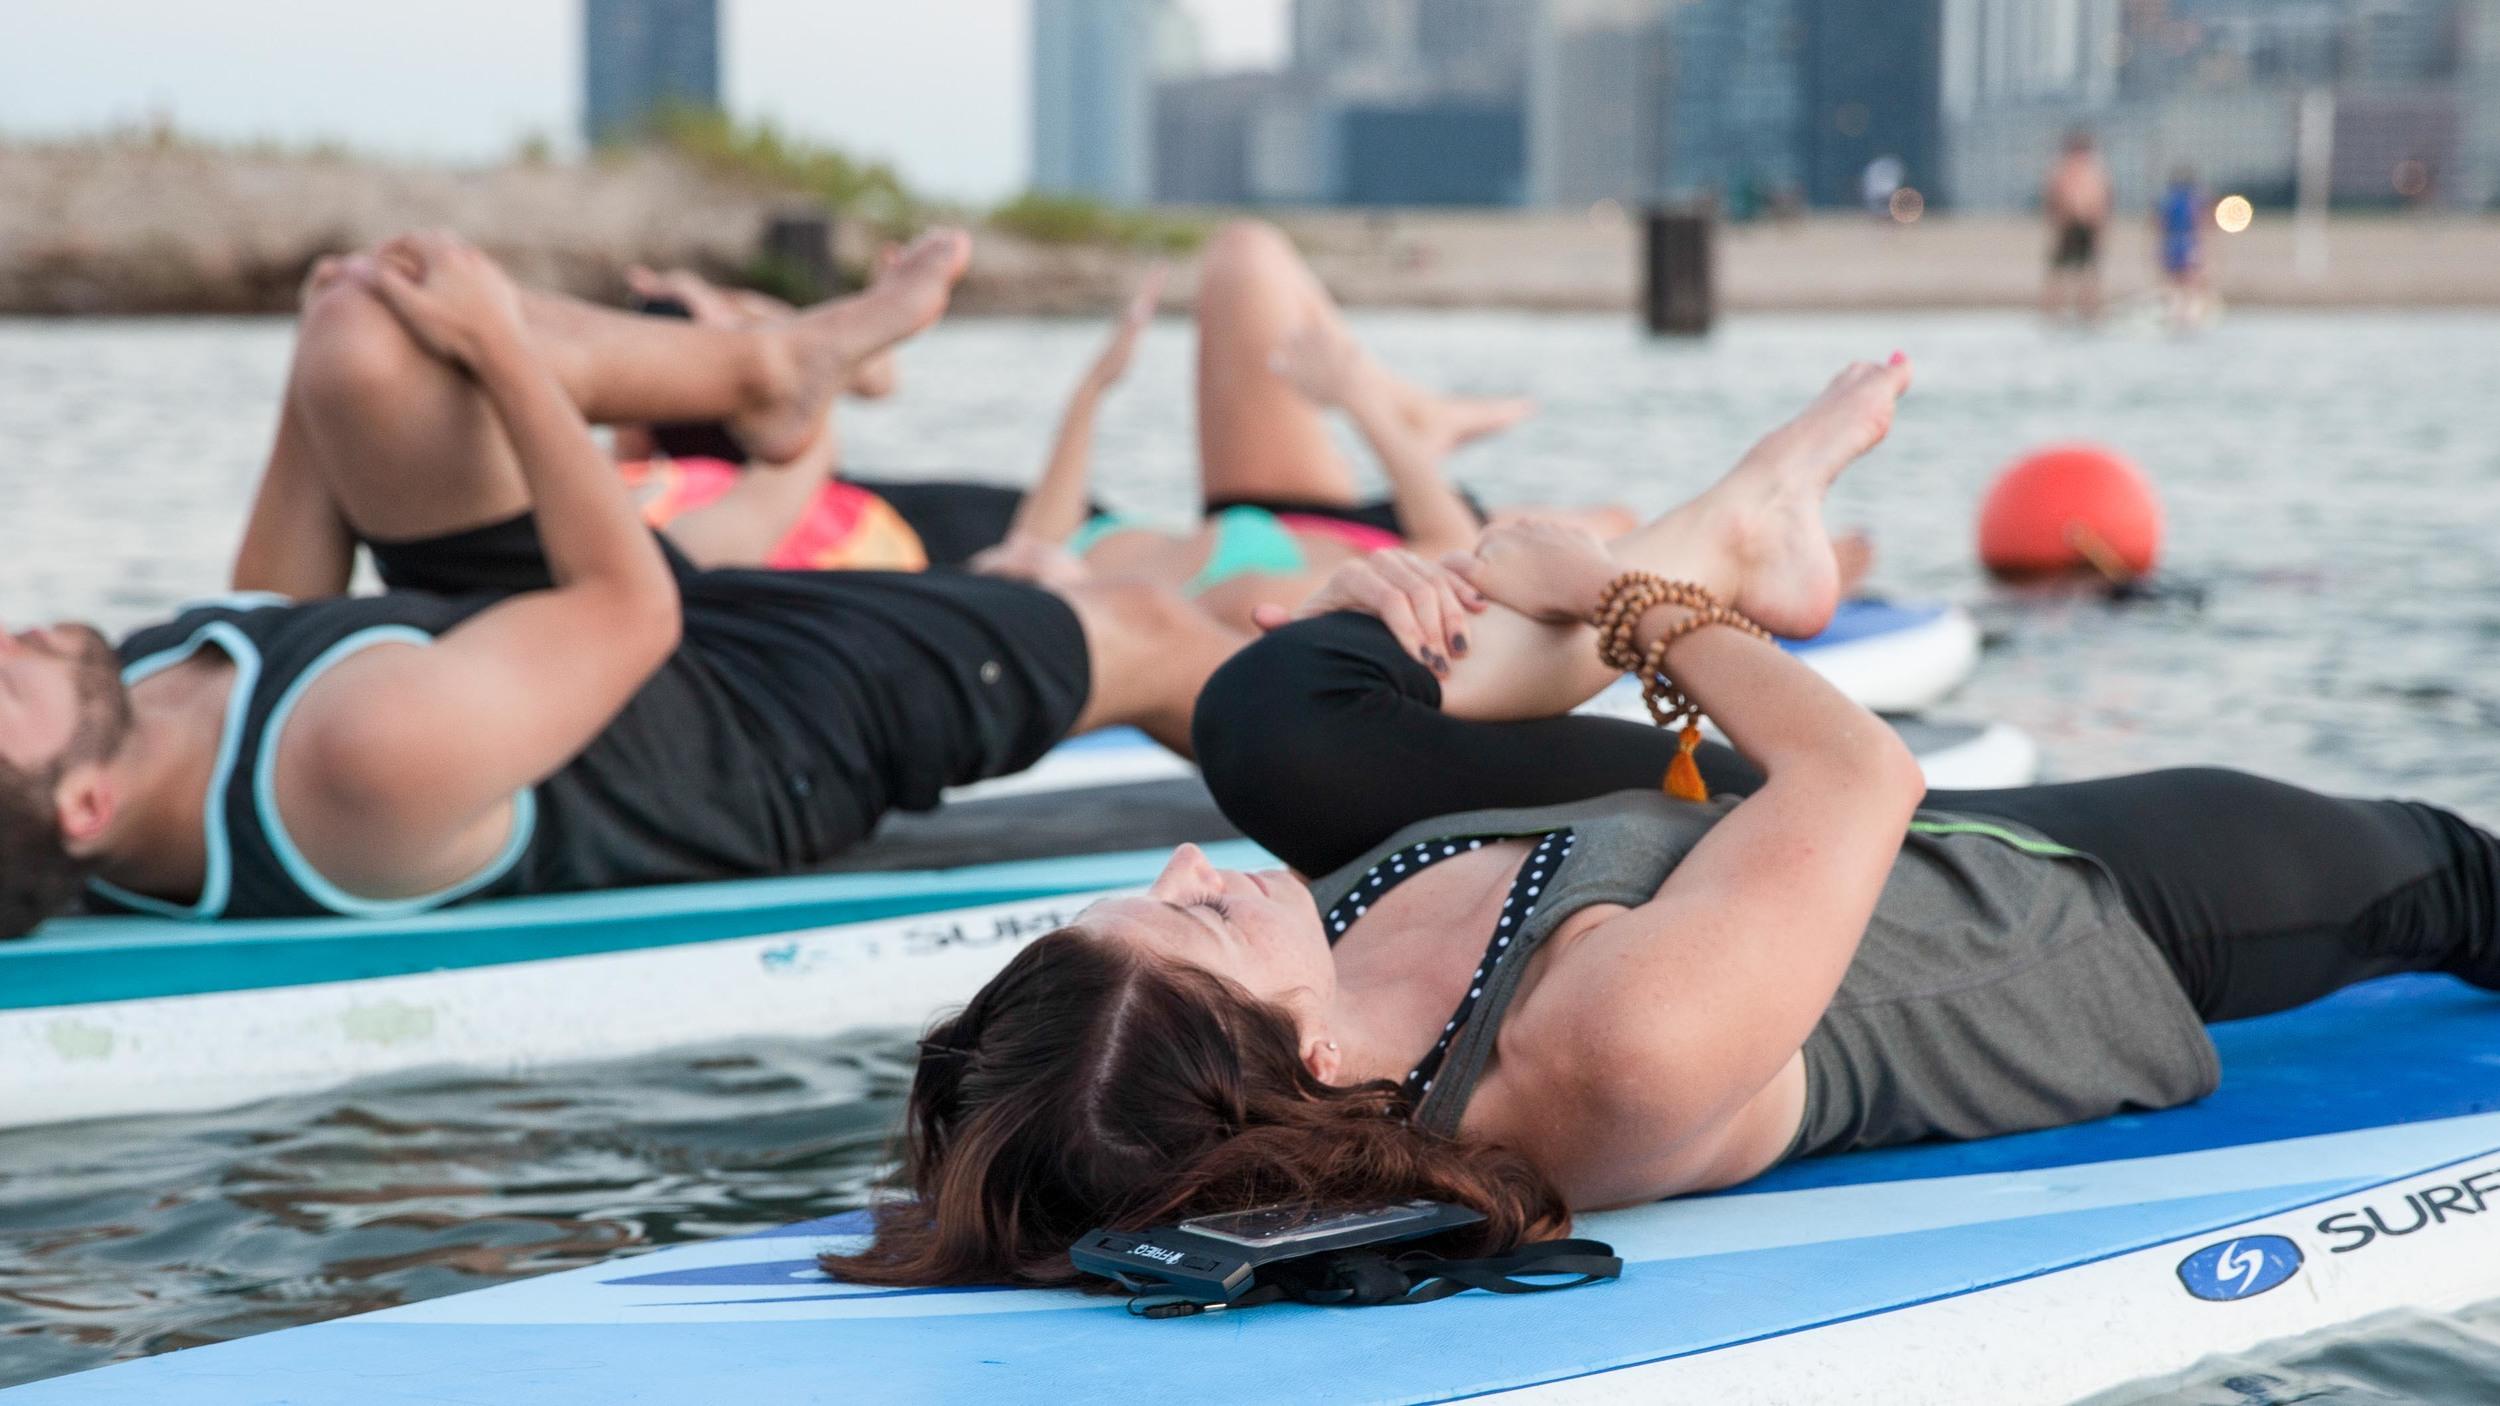 ChicagoSUP Yoga Fitness Photo (2 of 9).jpg